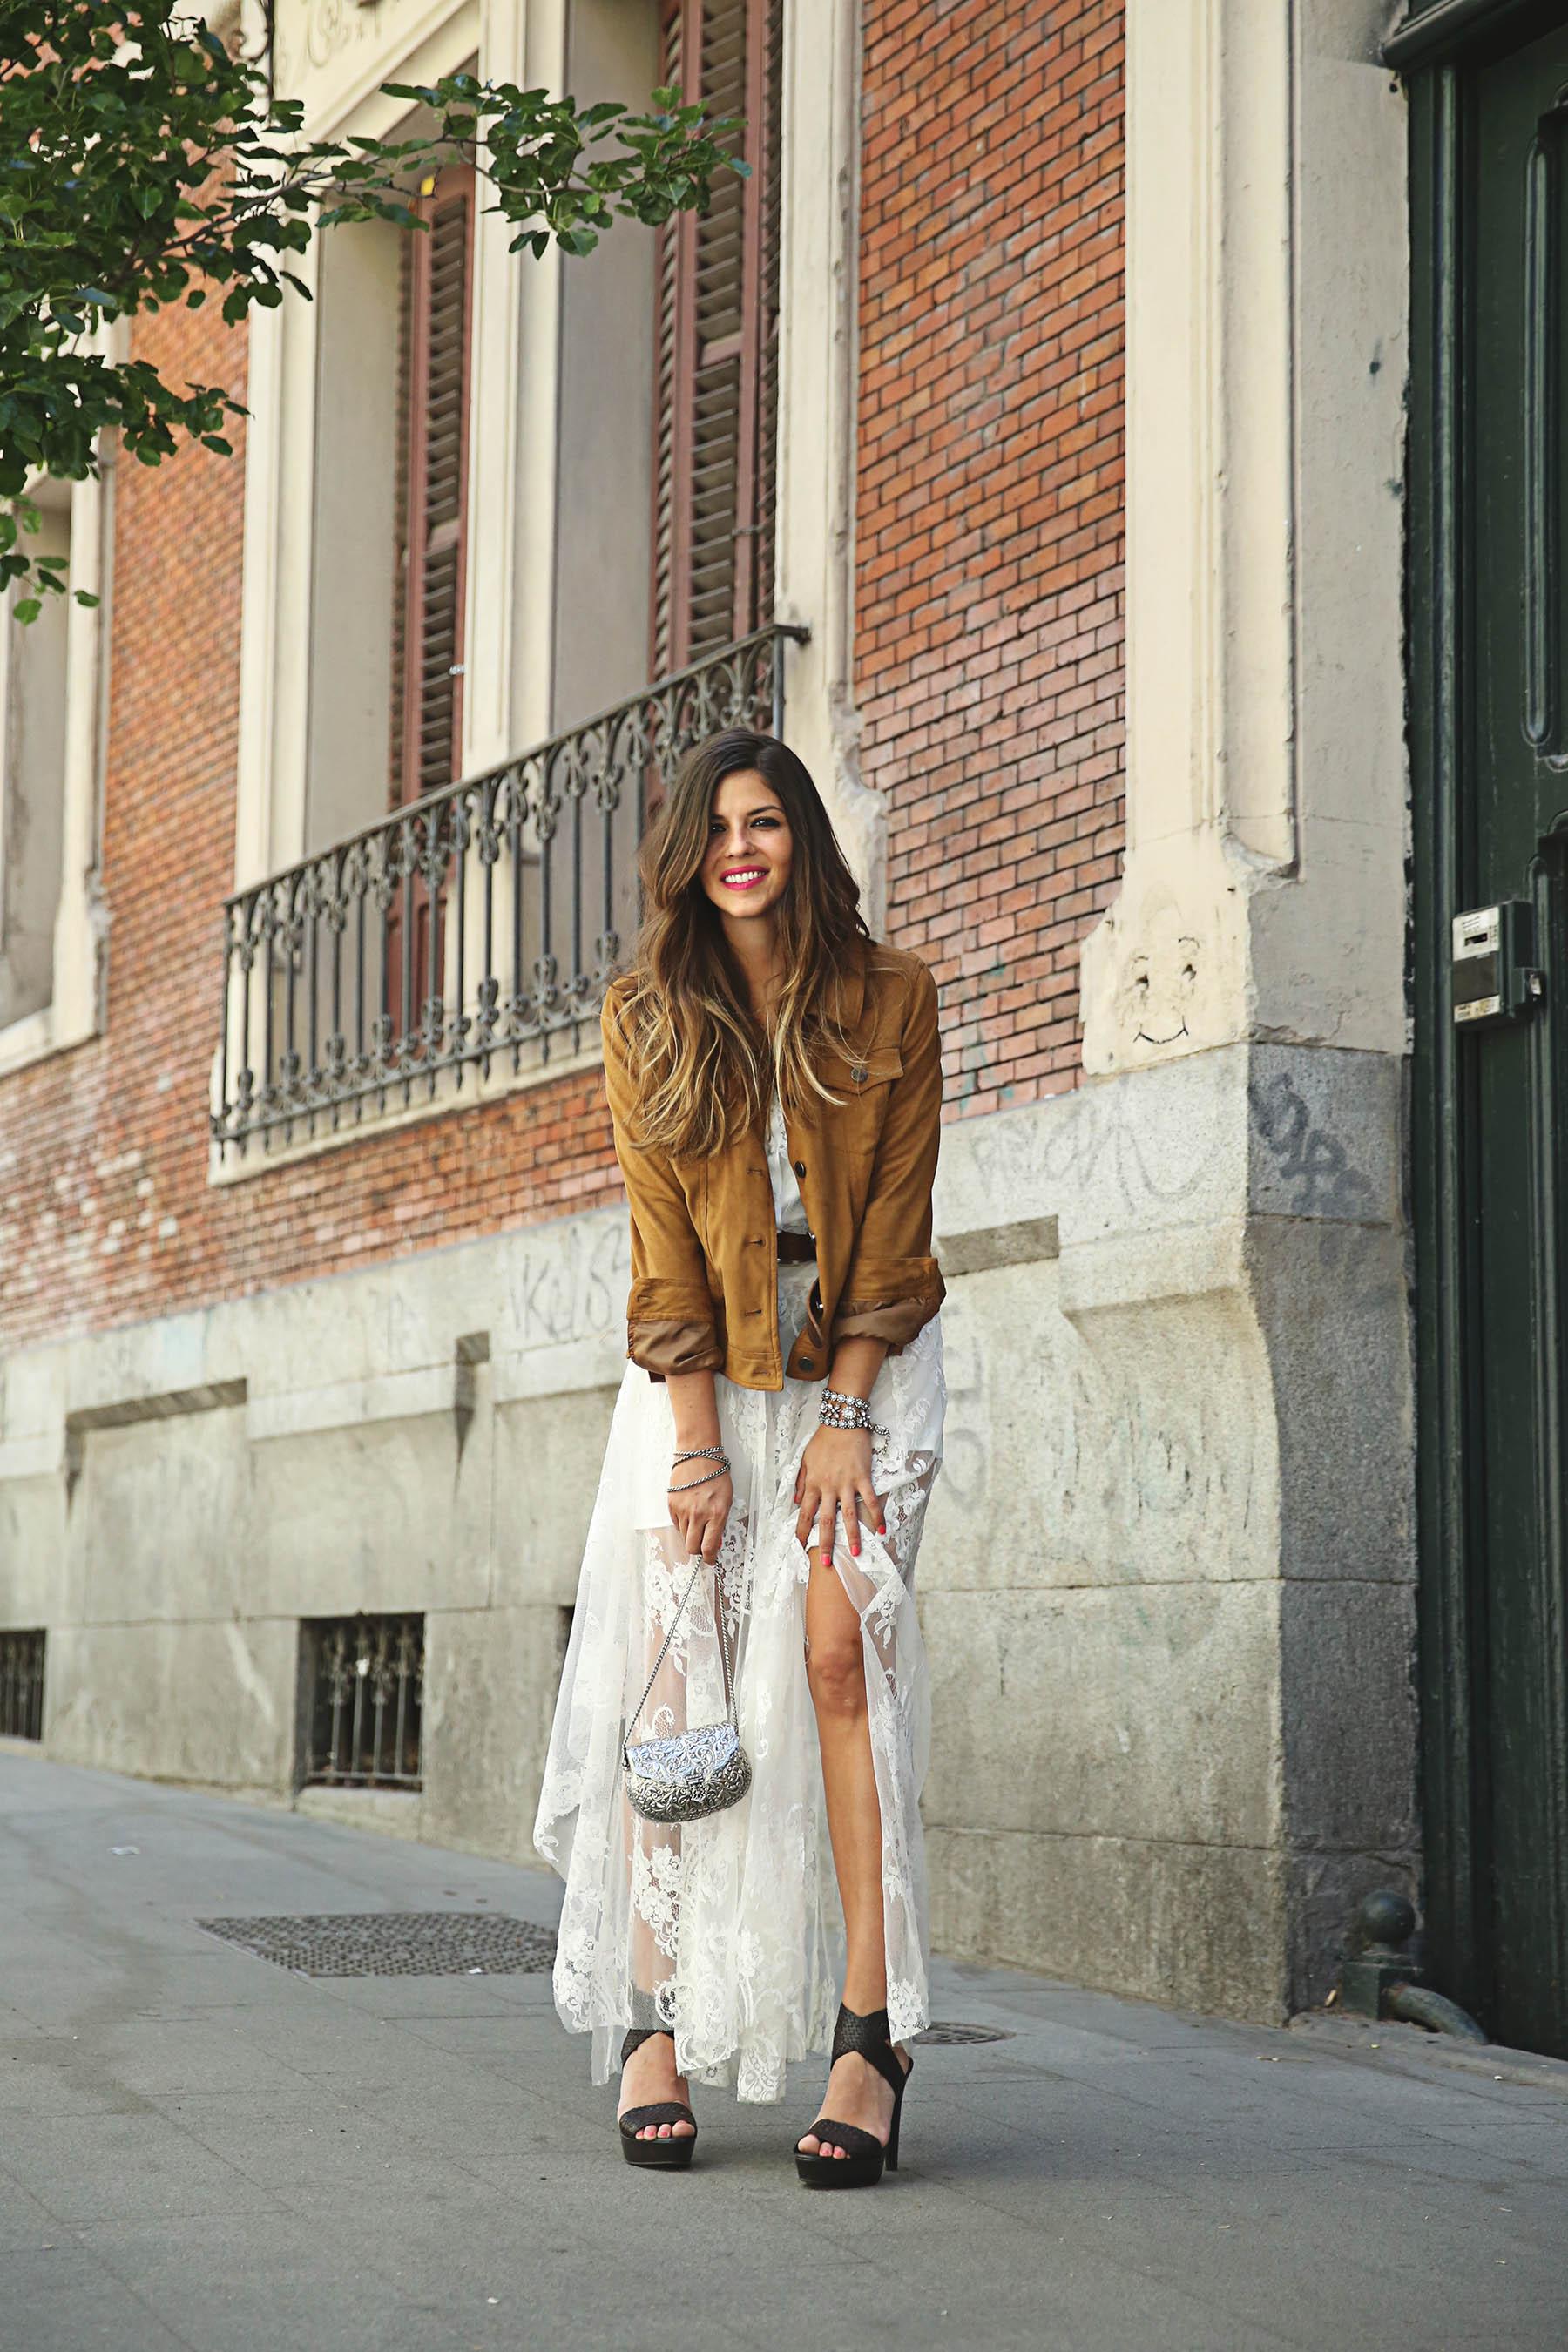 trendy-taste-look-outfit-street-style-ootd-blog-blogger-fashiopn-spain-moda-españa-magnum-juana-acosta-maje-7